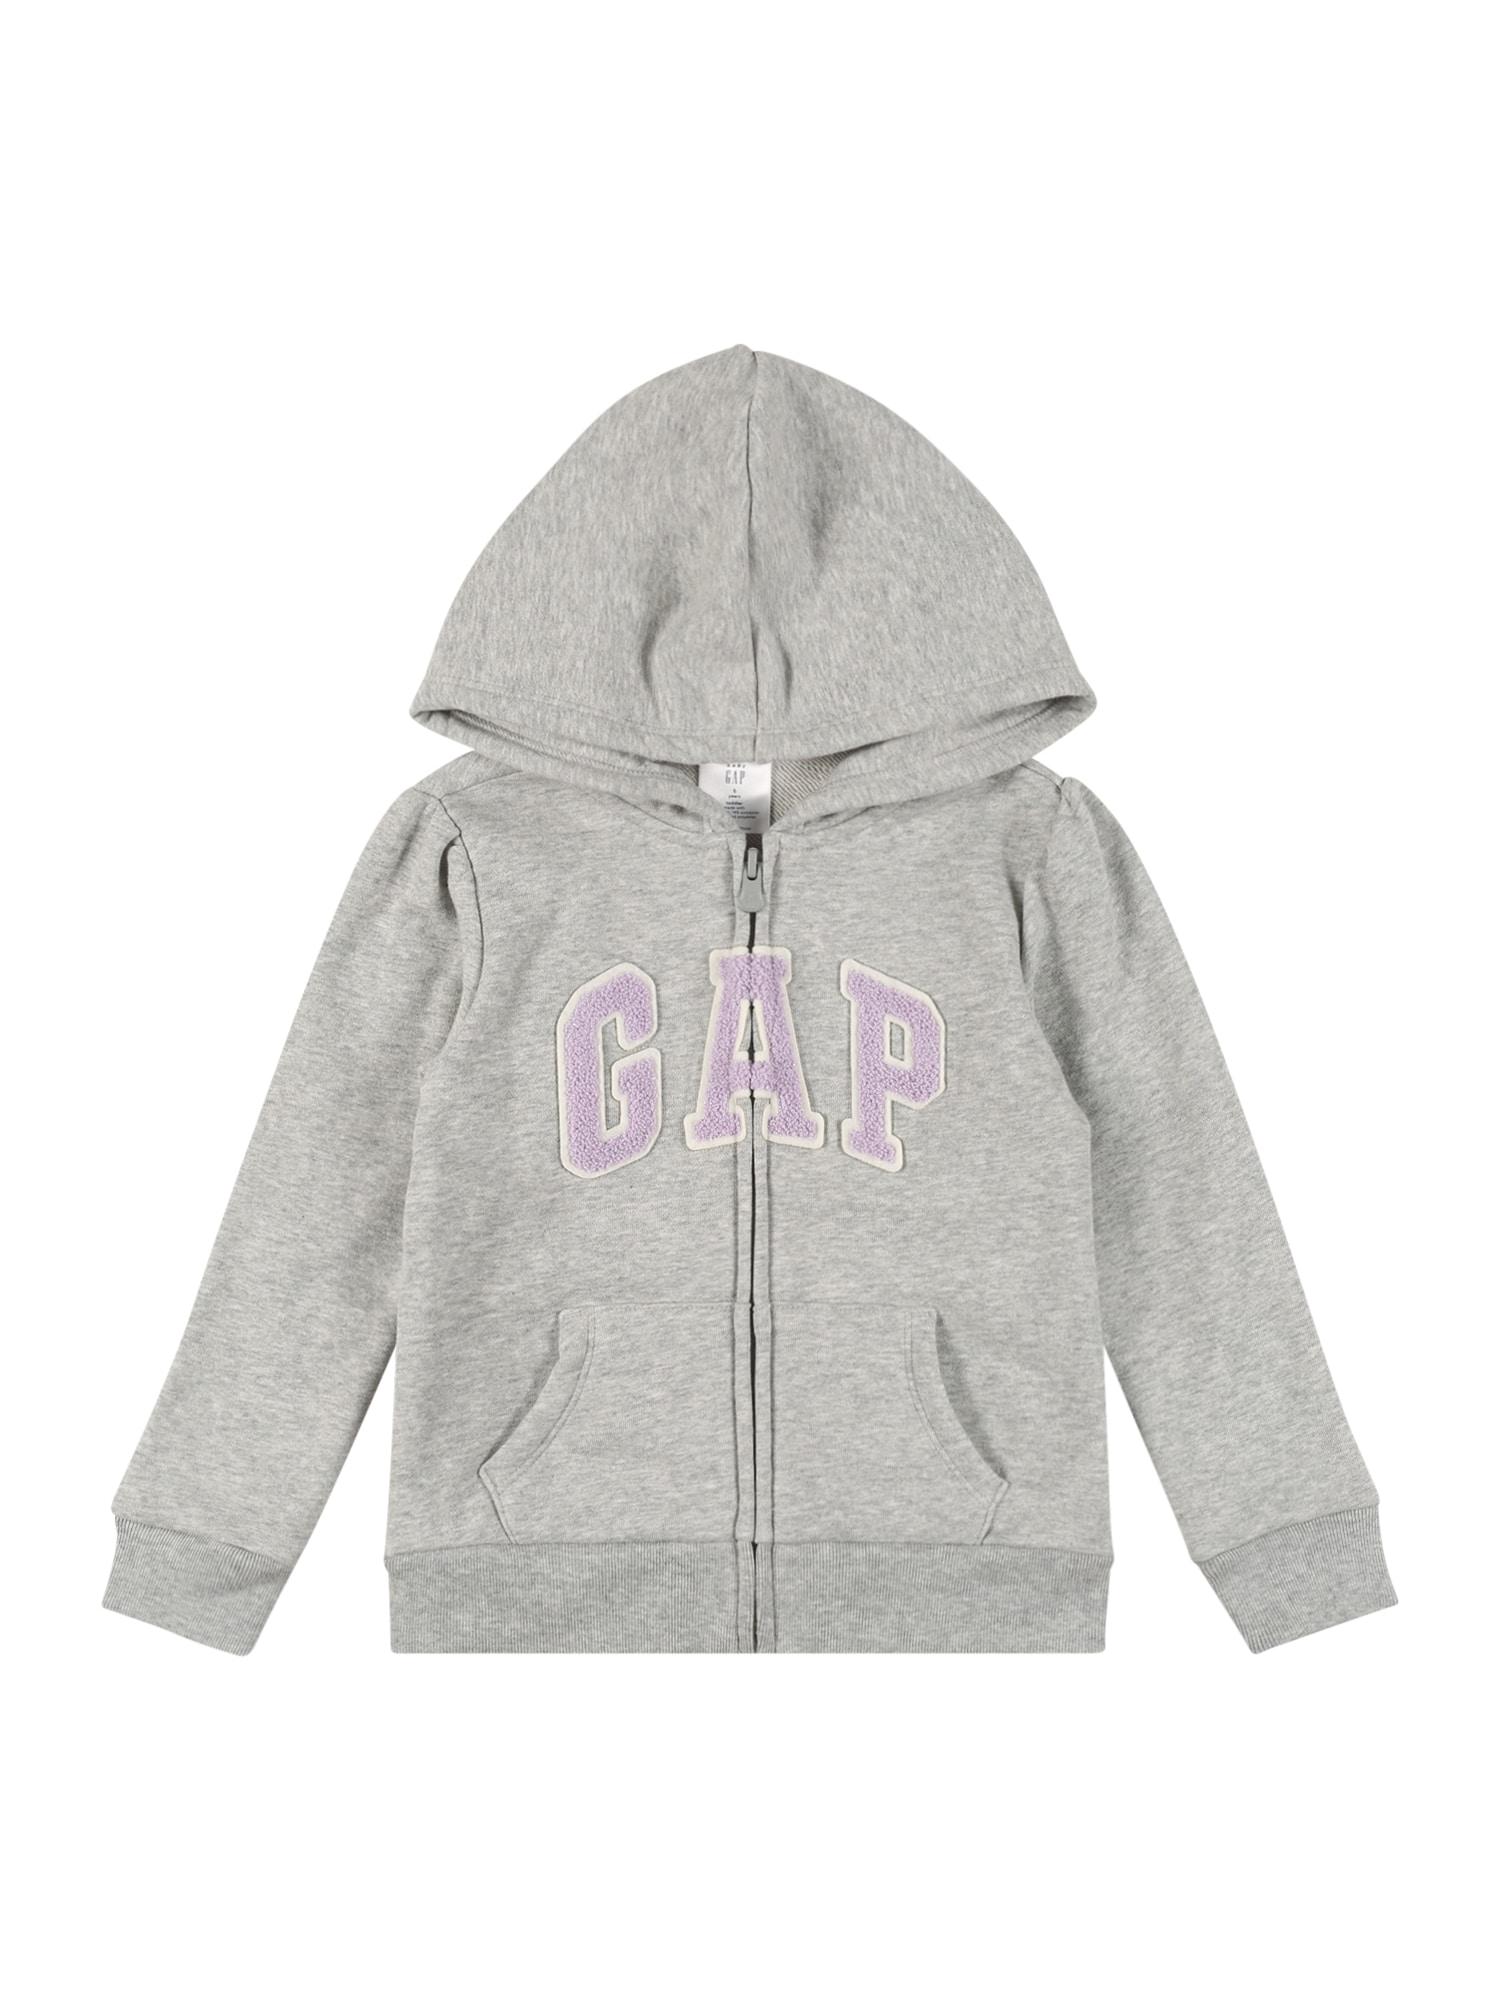 GAP Džemperis margai pilka / balta / rausvai violetinė spalva